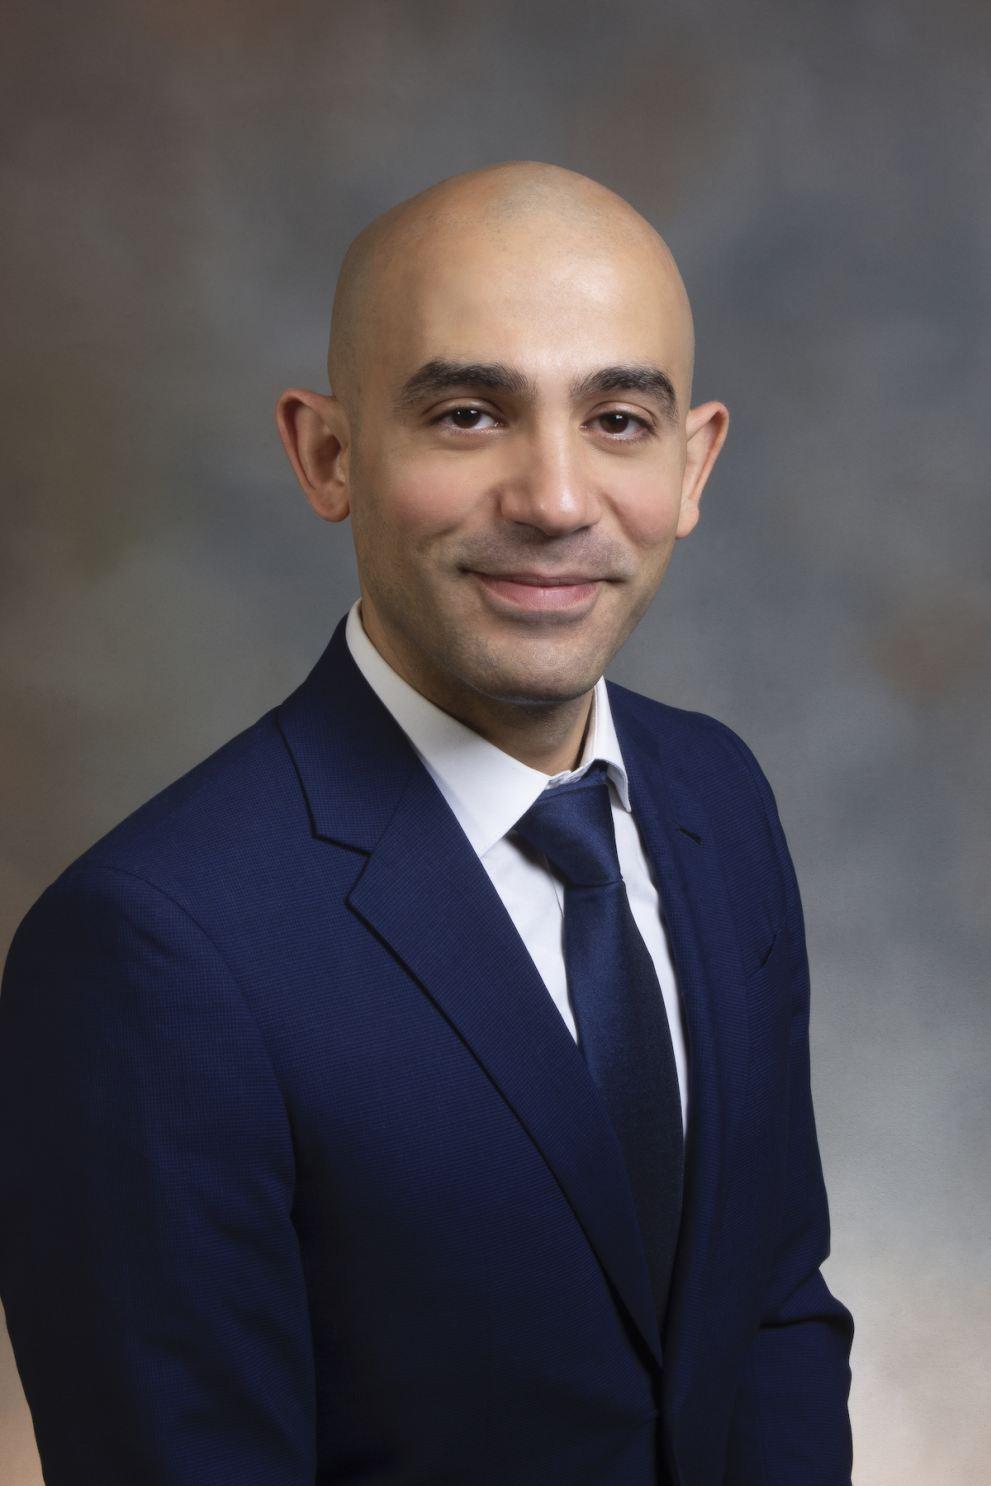 Dr. Shadie Azar